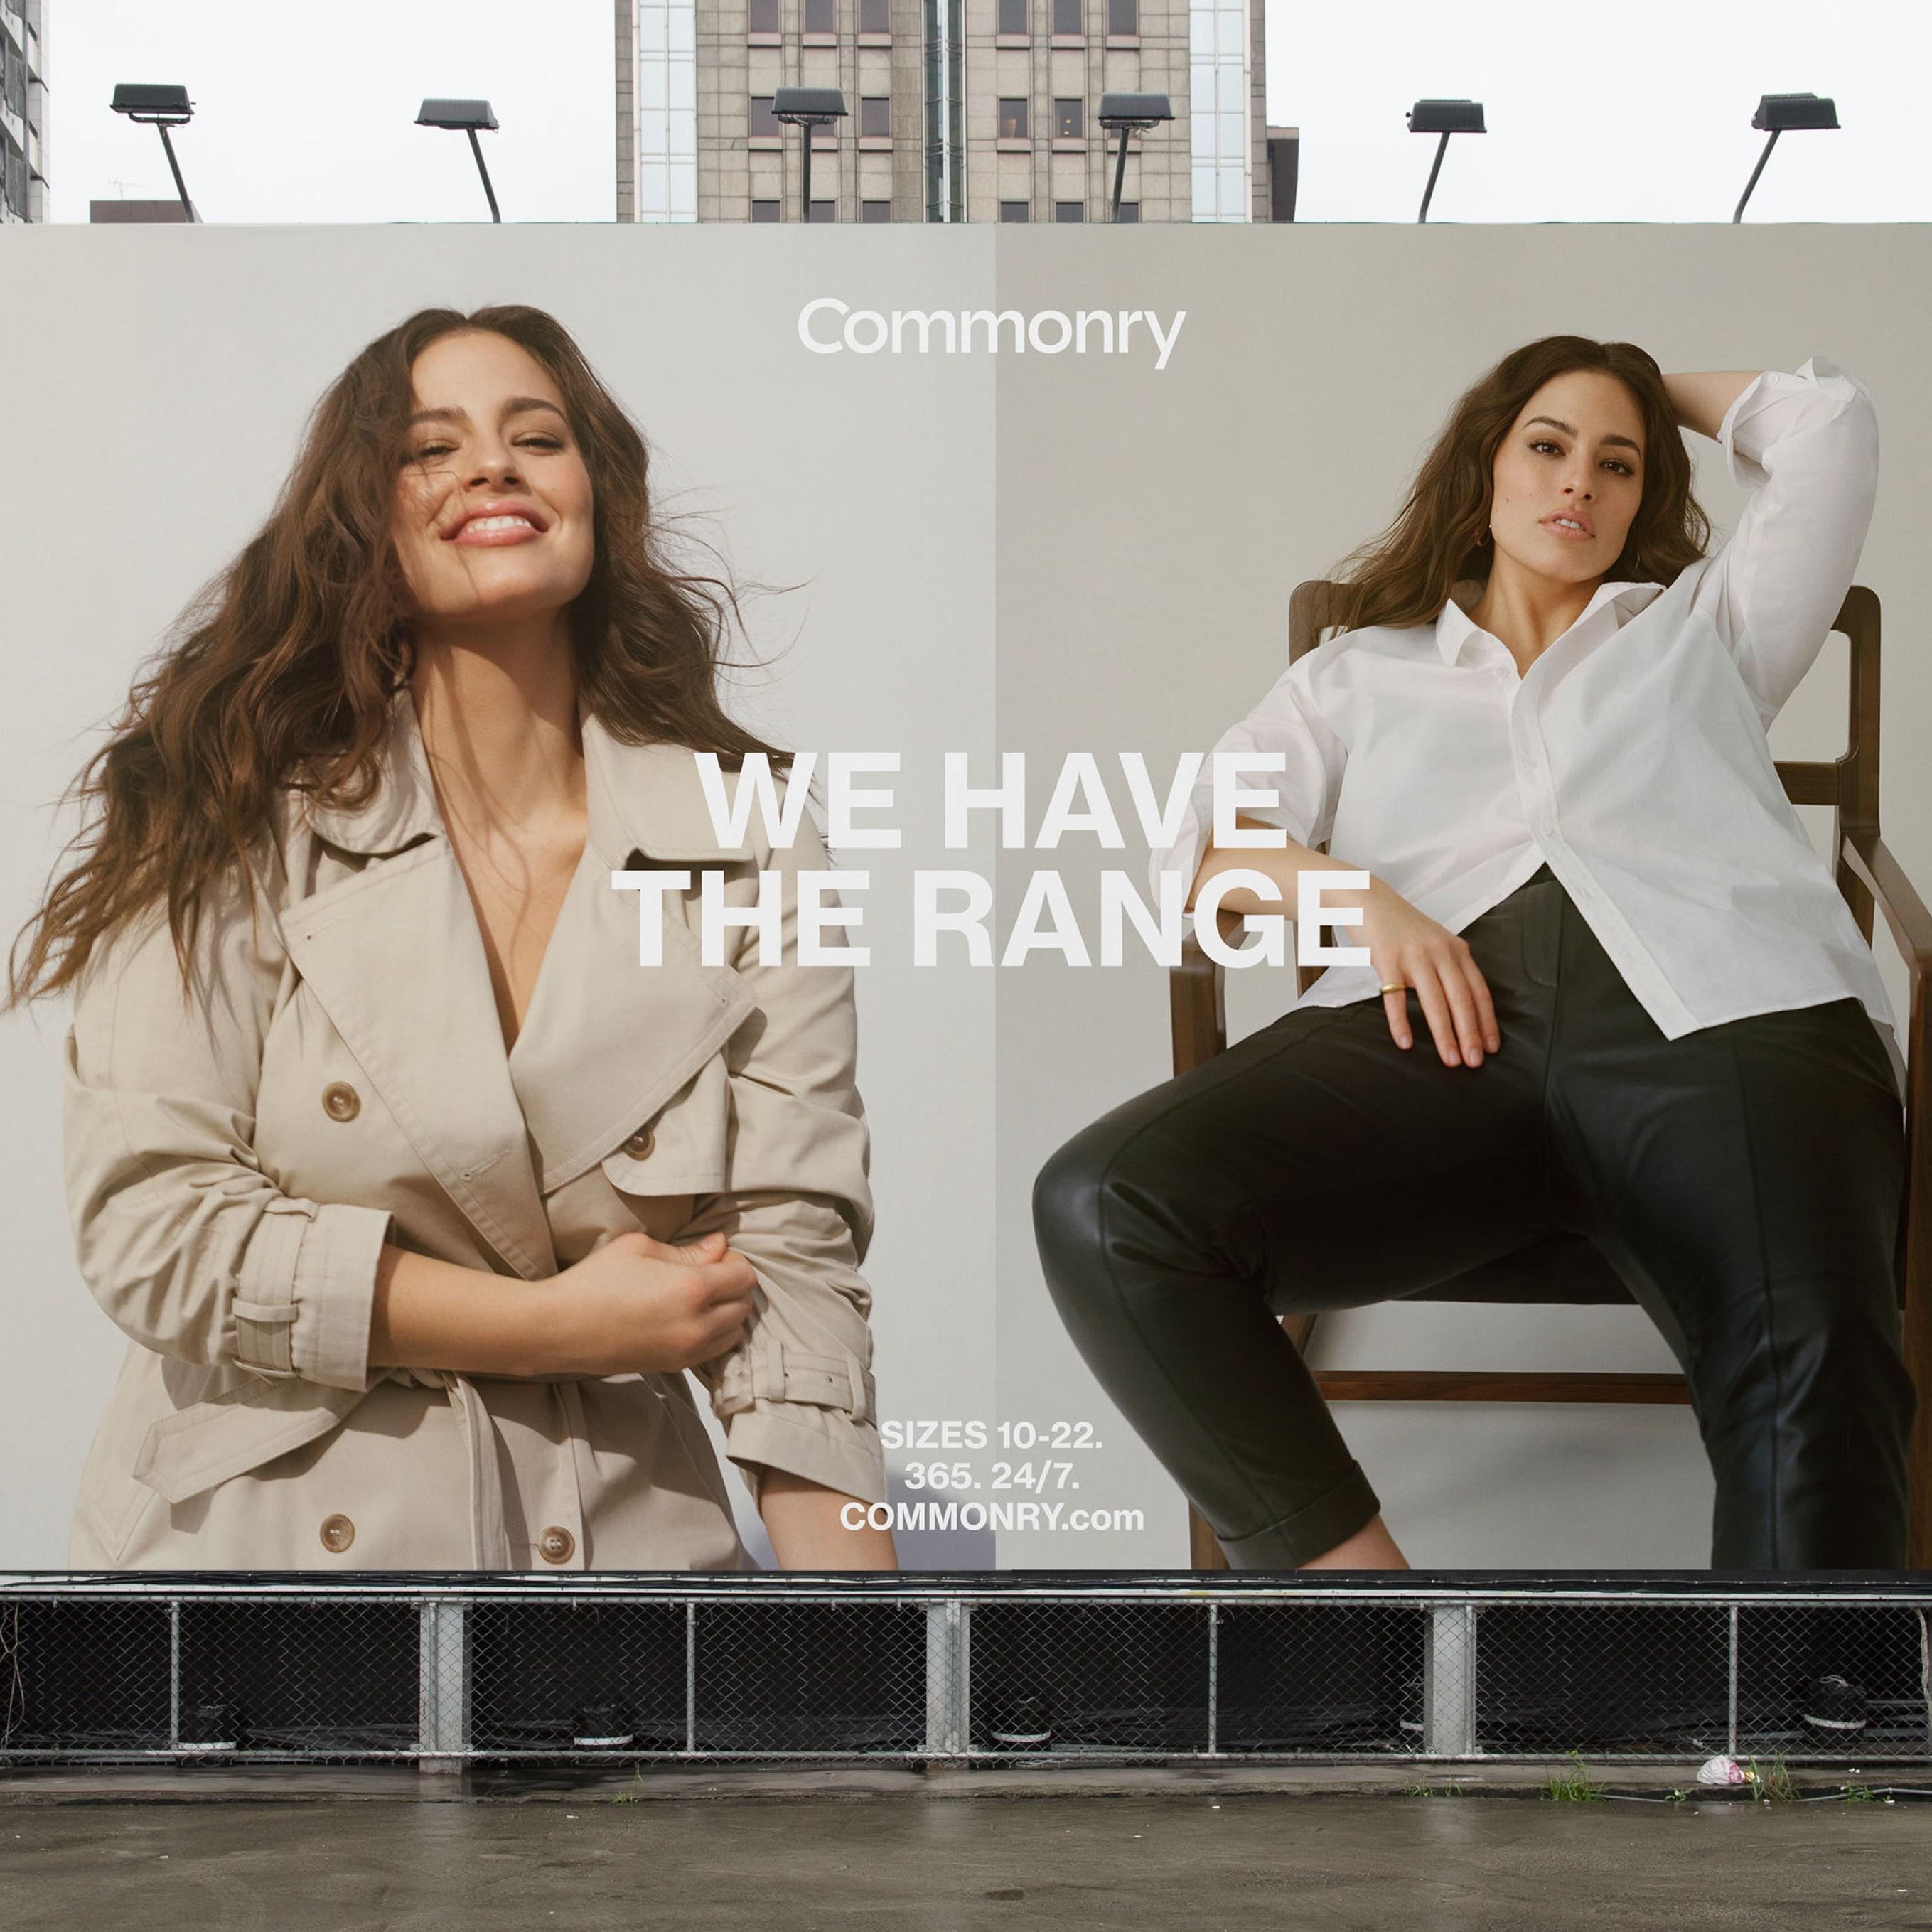 Commonry billboard